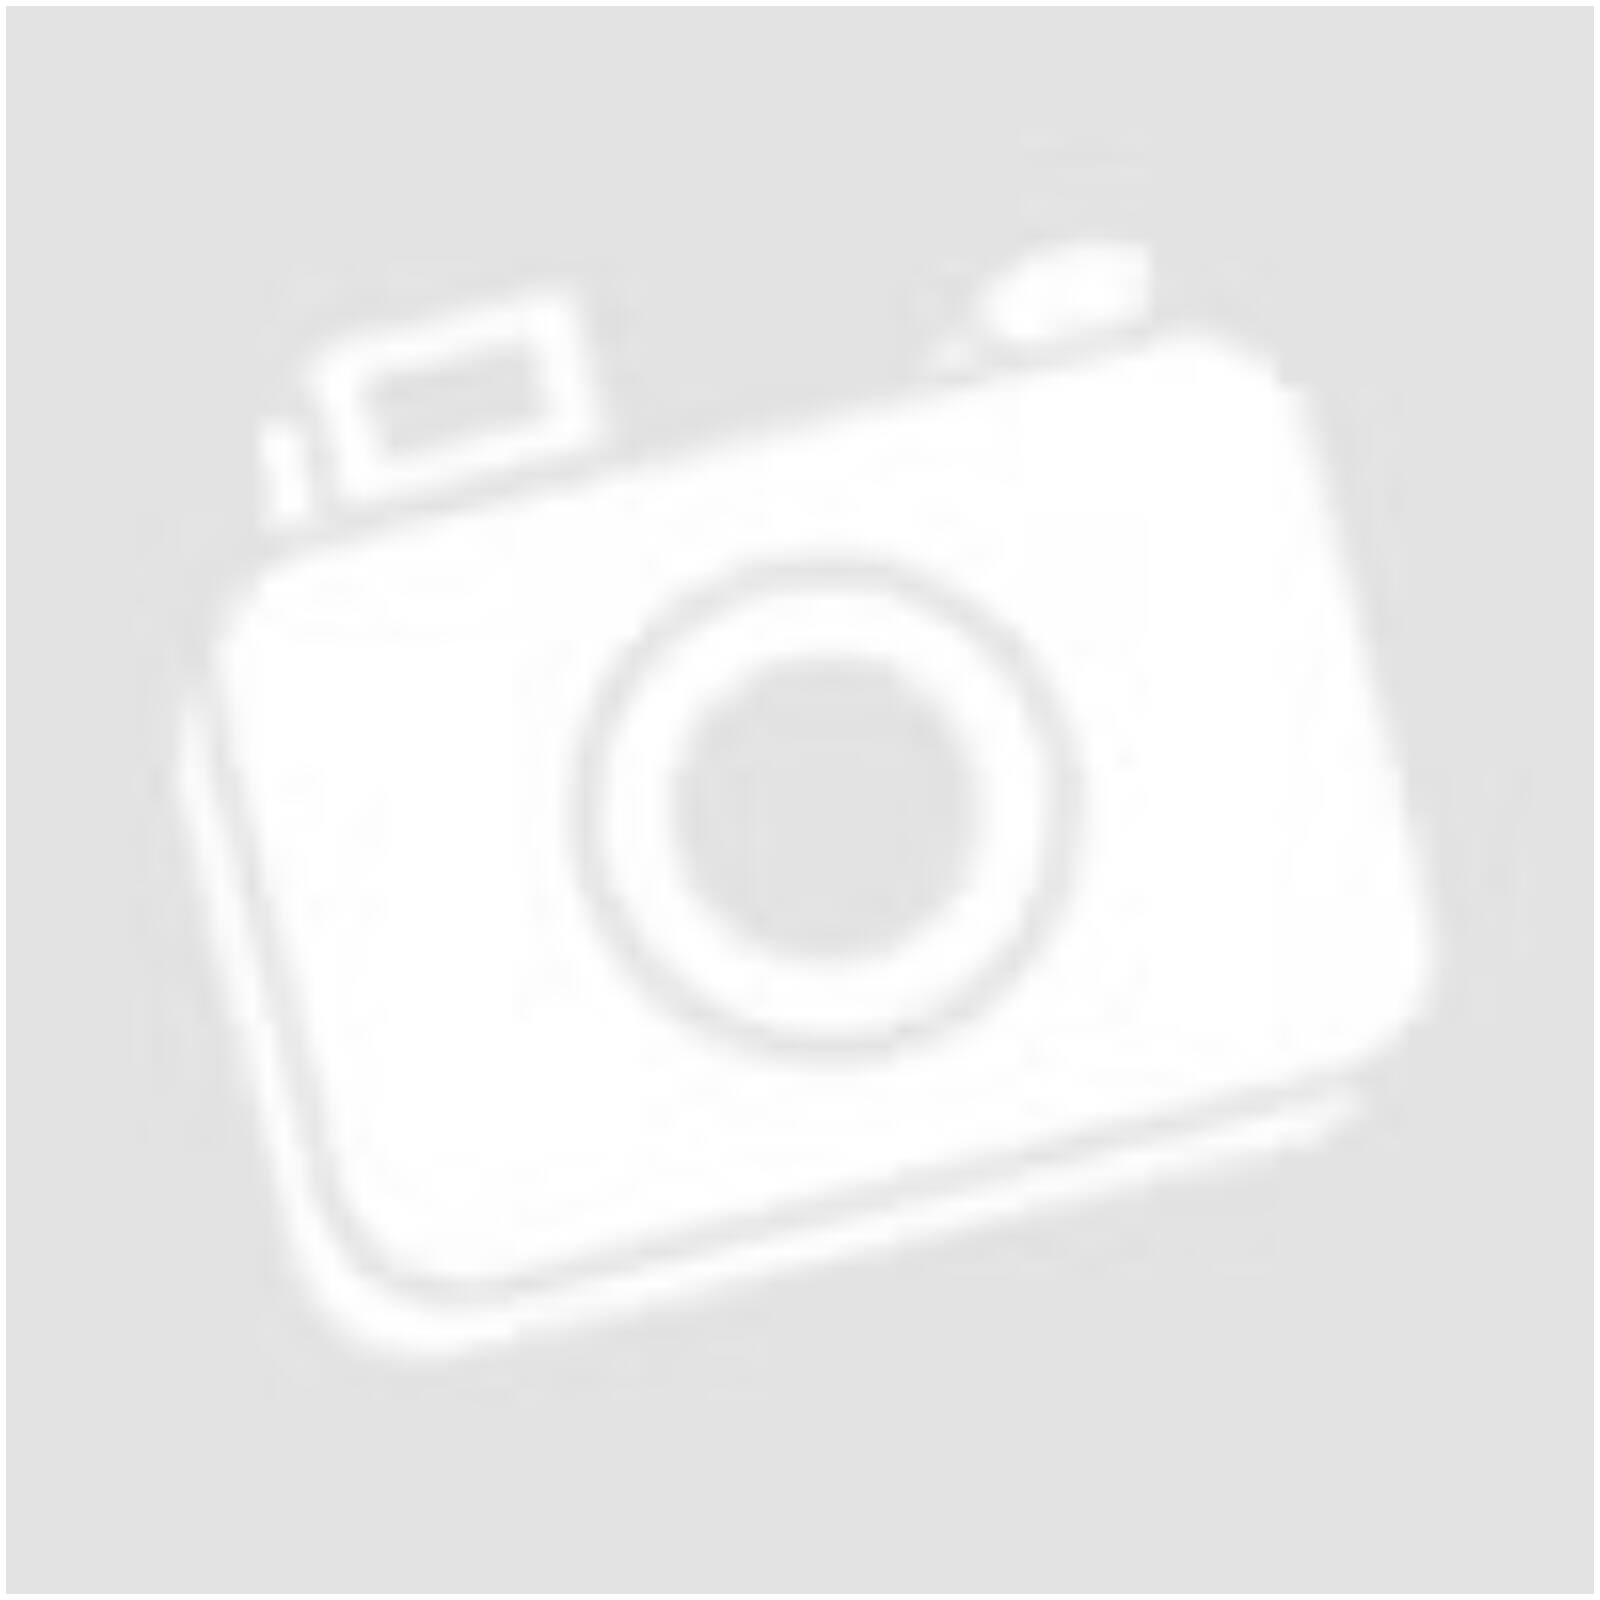 Fülbevaló Swarovski fehér 10mm / pár